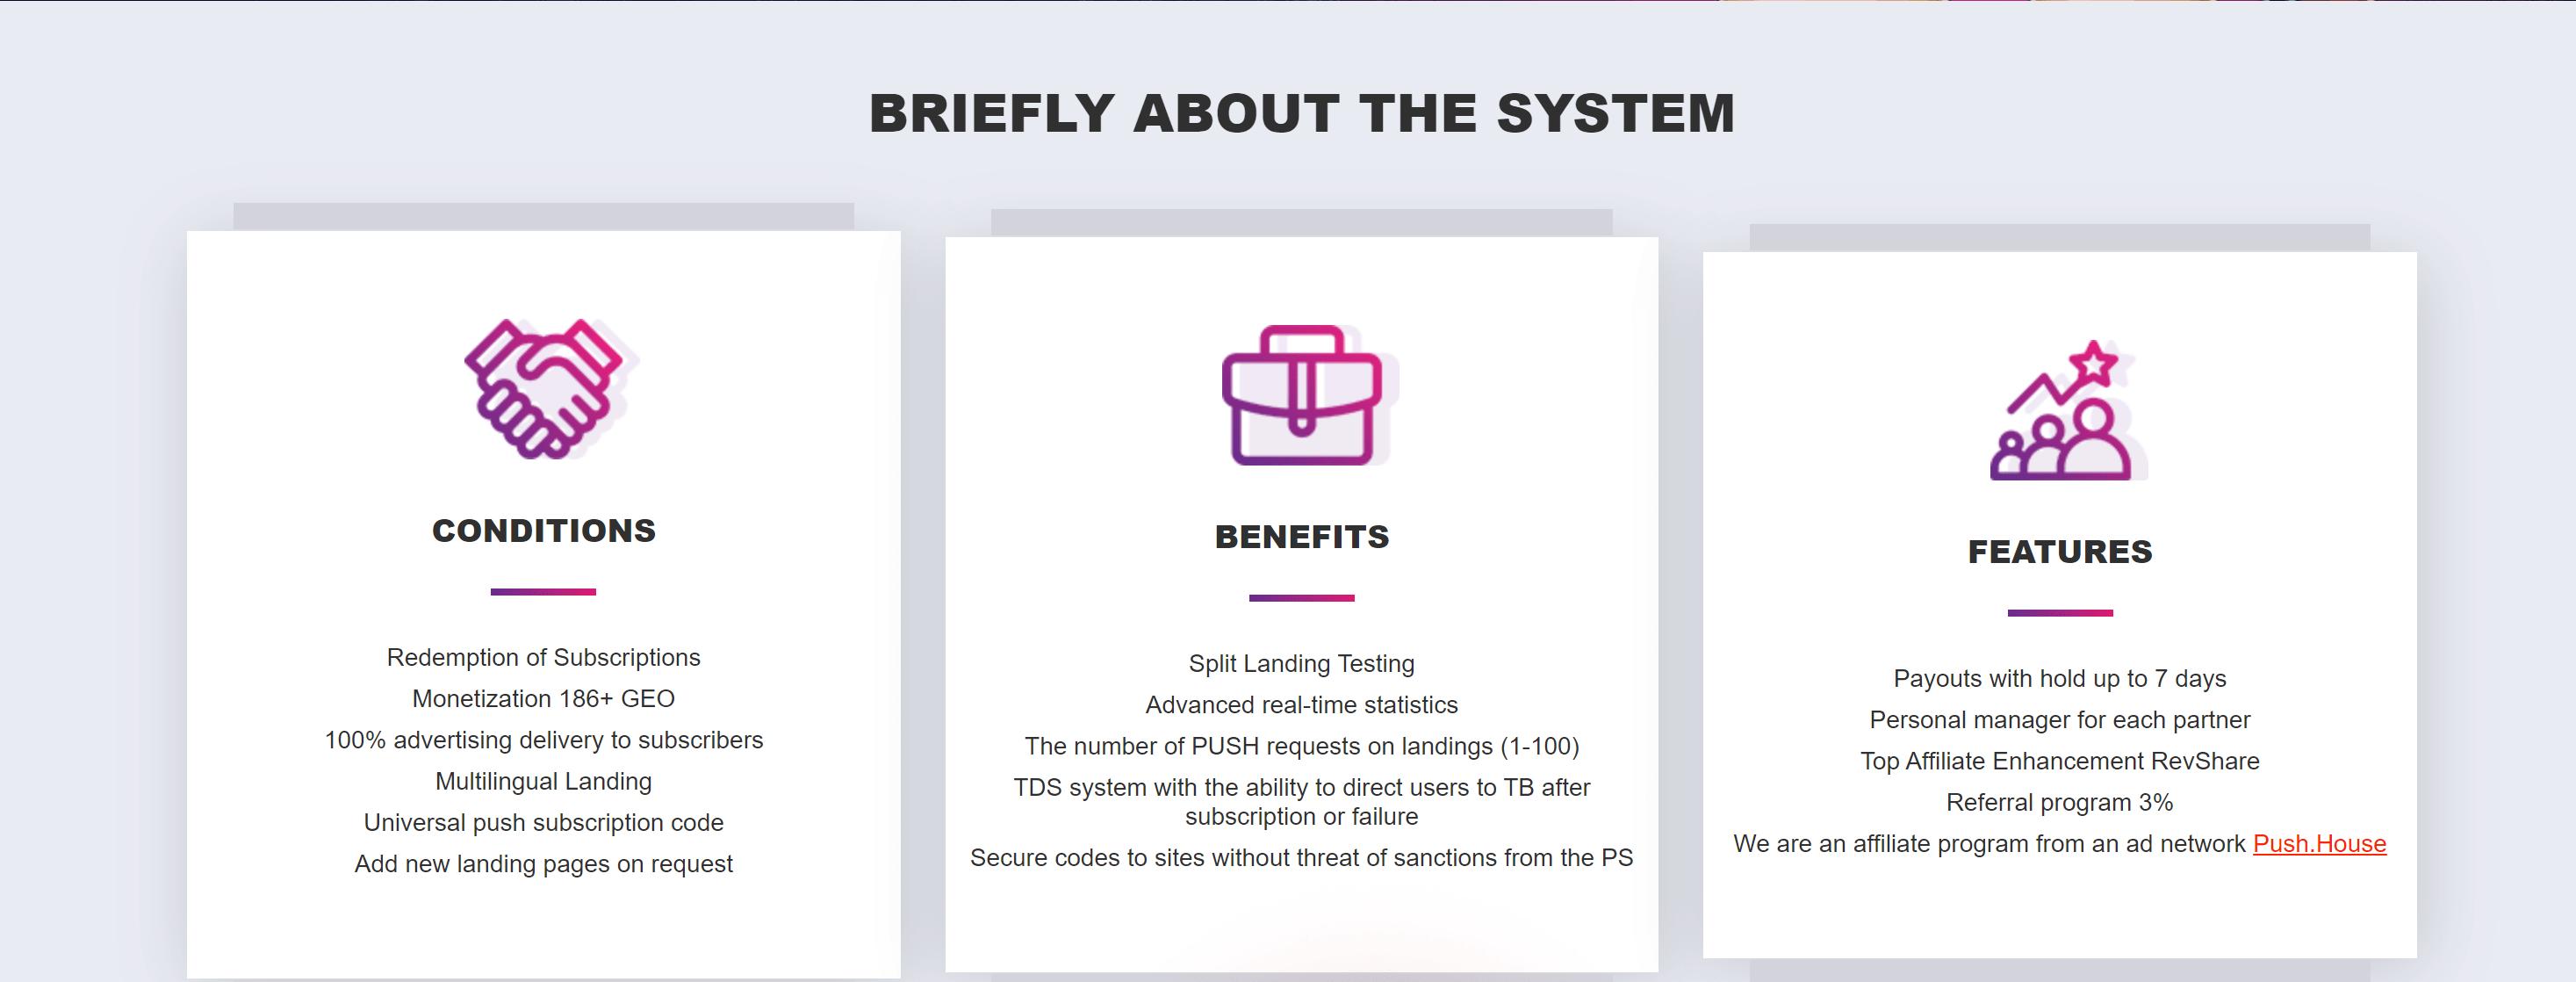 partners house benefits